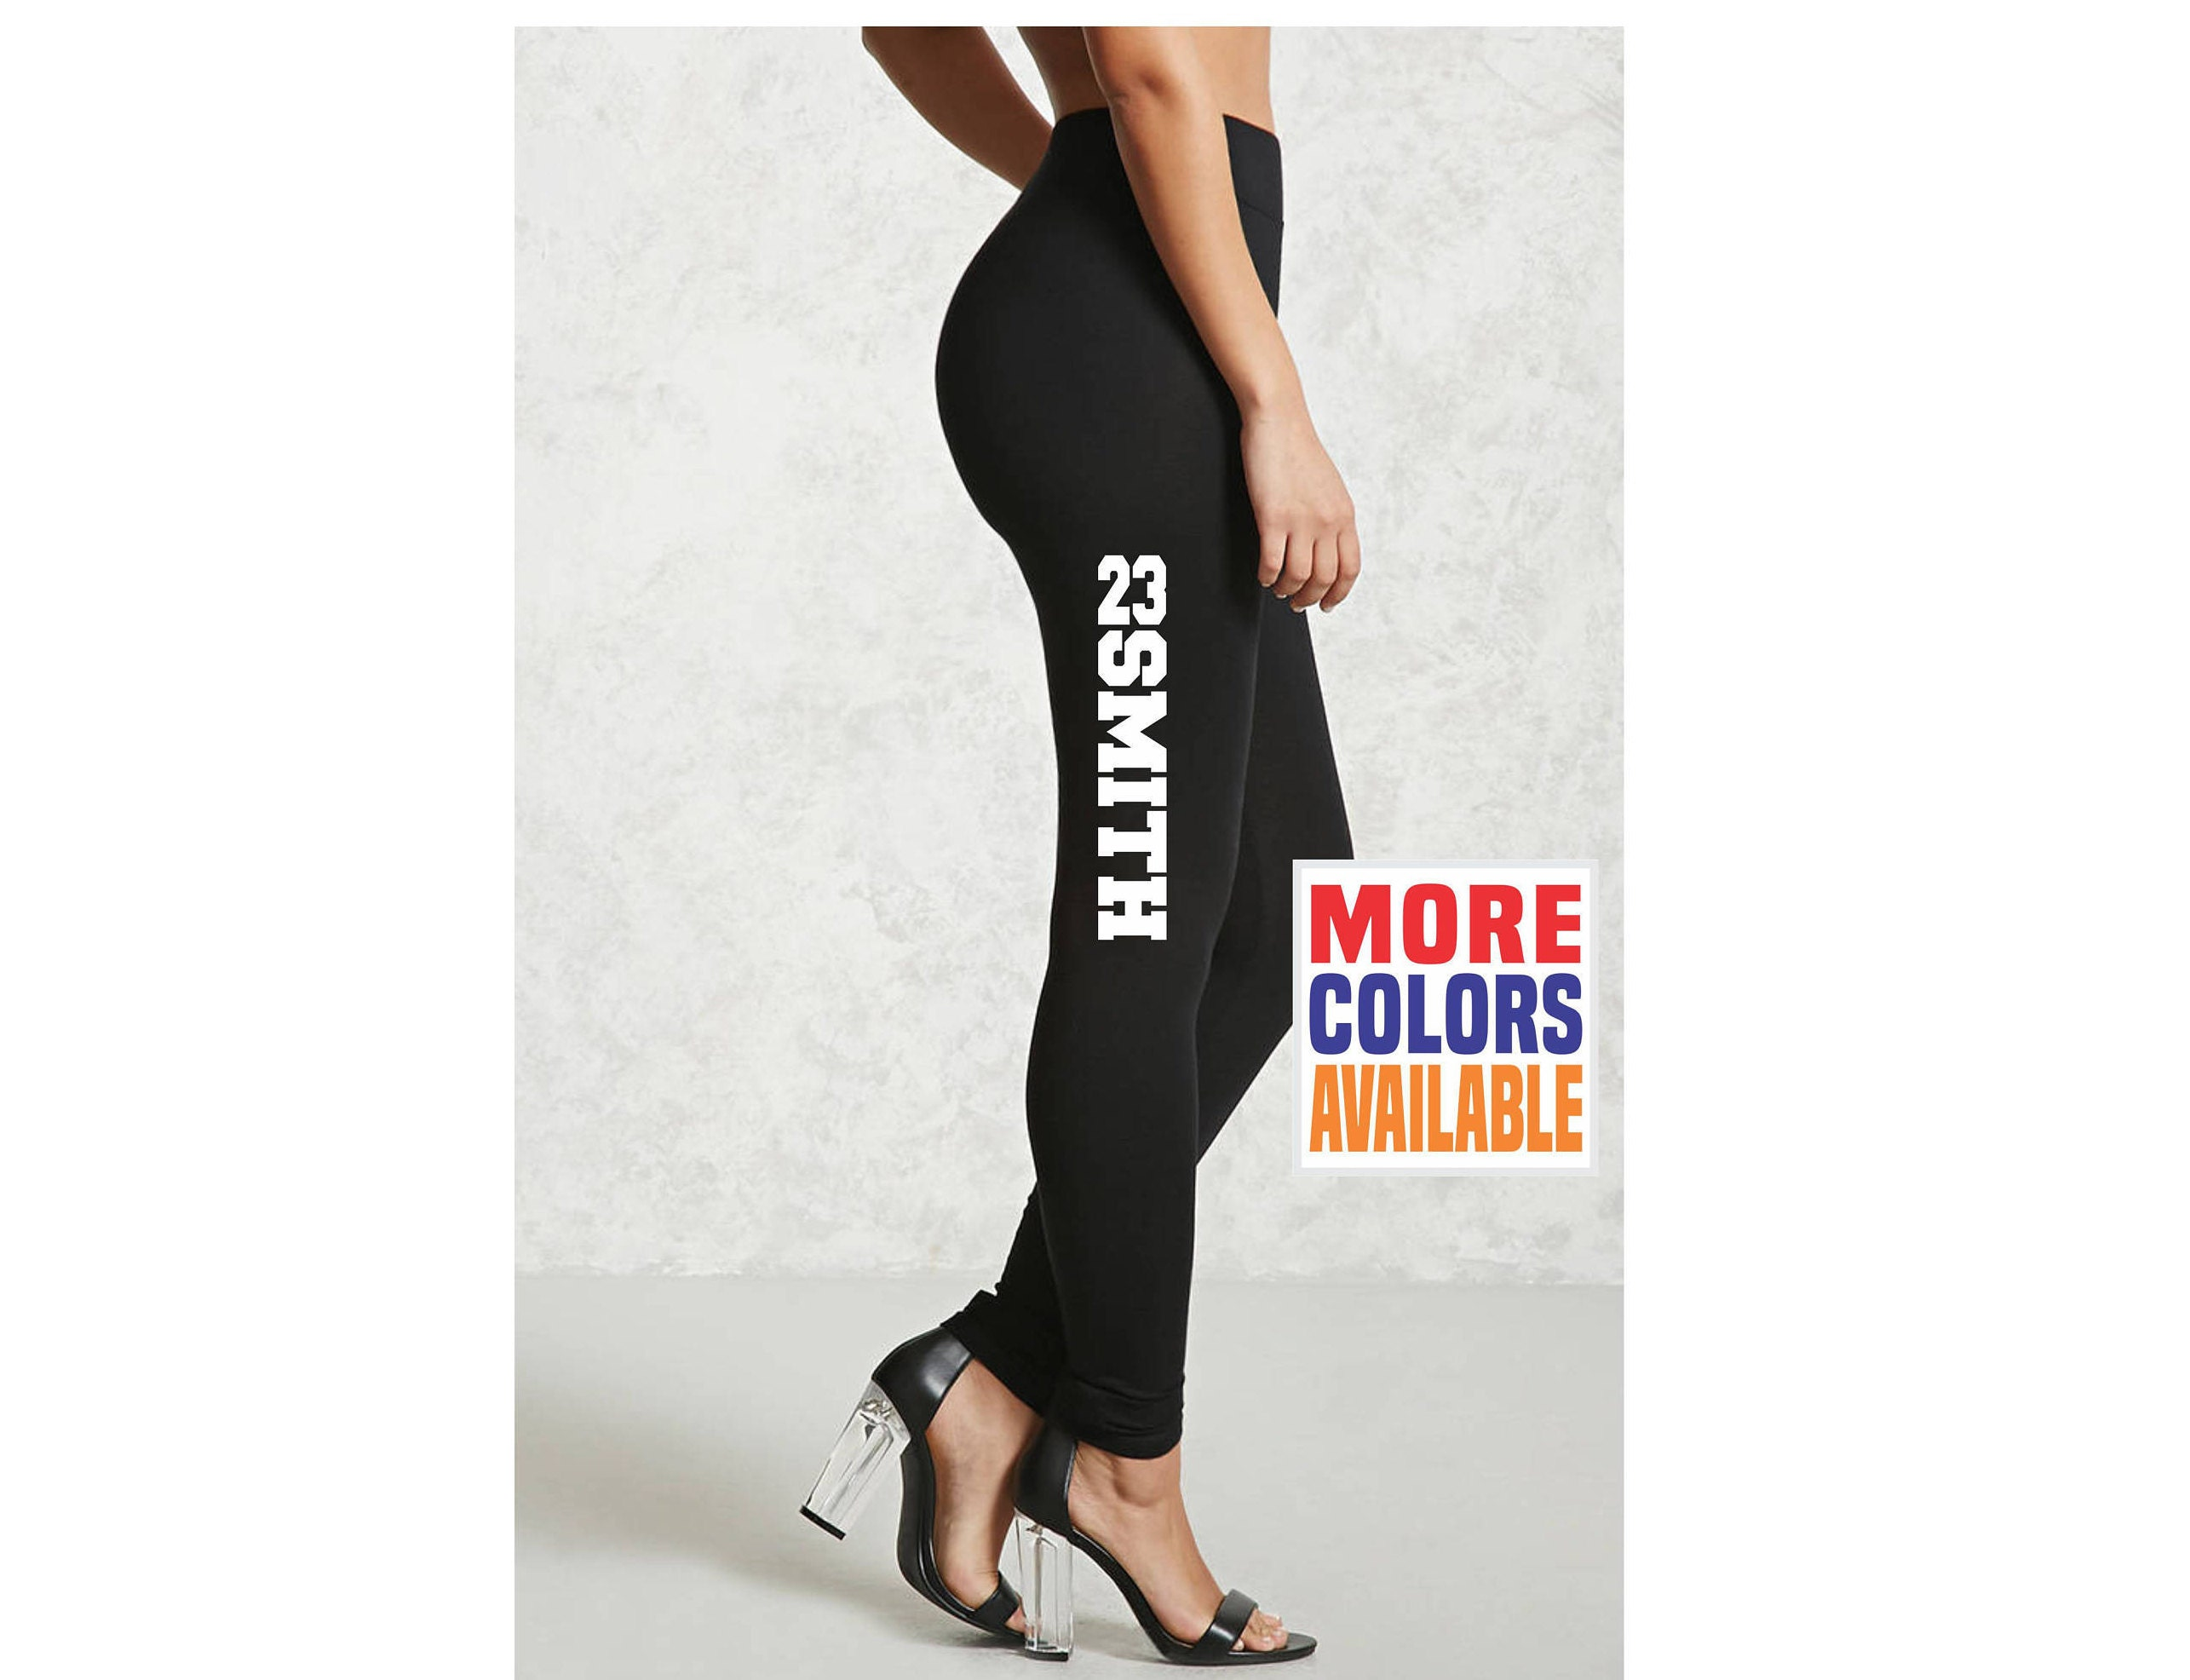 NAME NUMBER LEGGINGS Black Pants Workout Yoga Gym Side Leg Your Text